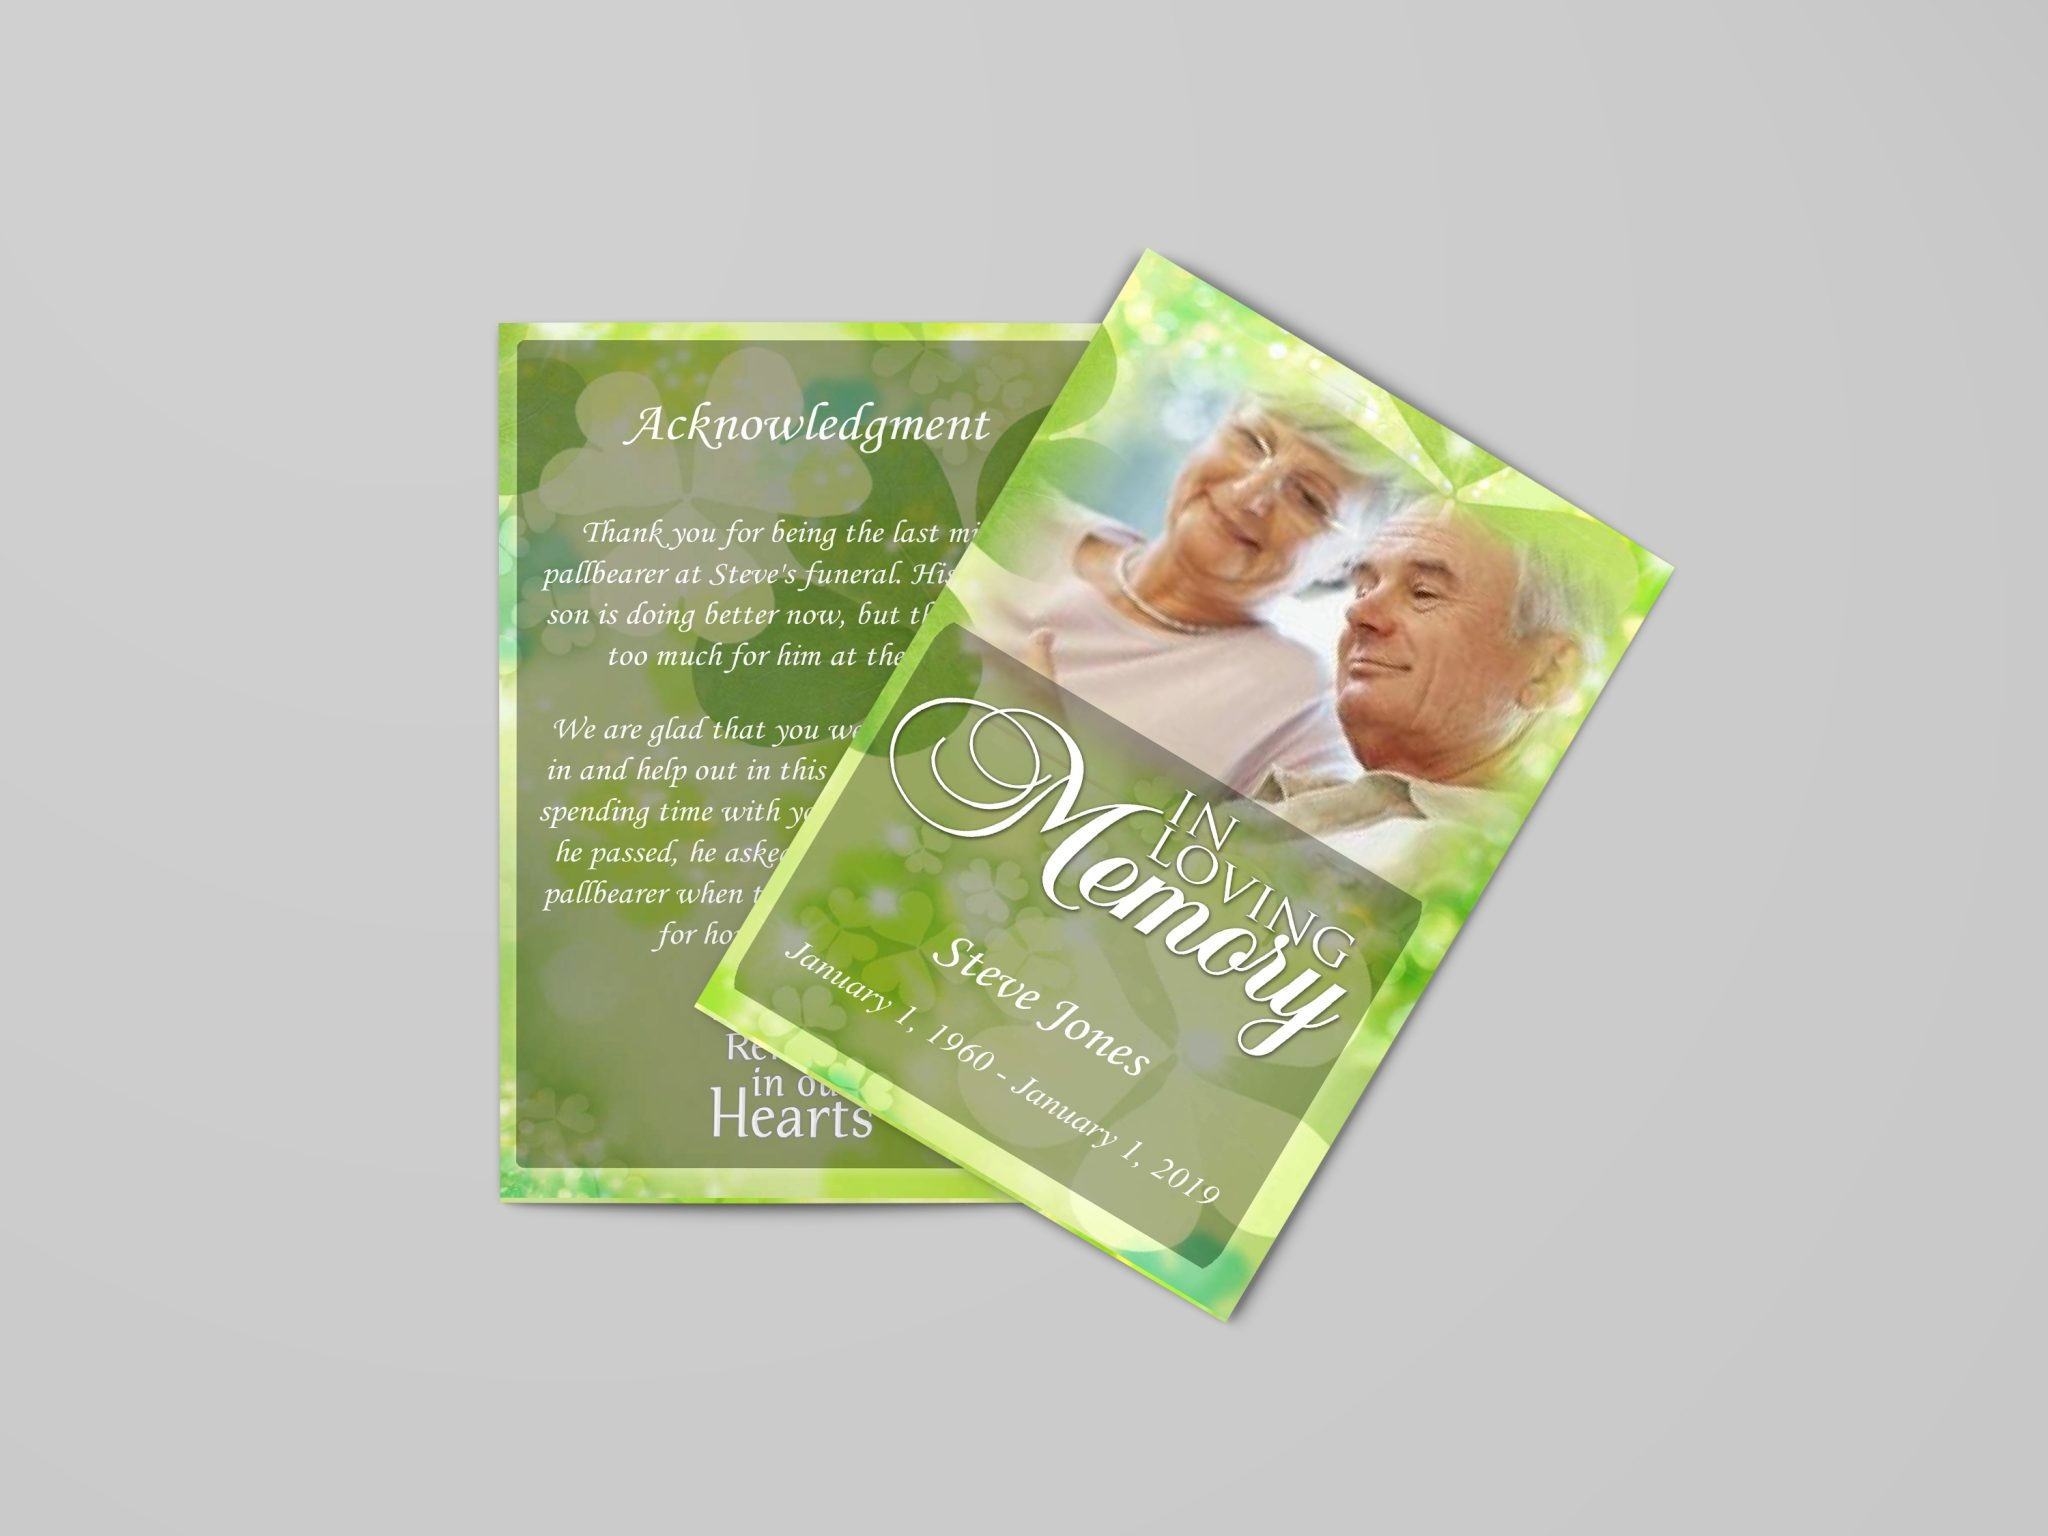 Celtic Irish Green Funeral Program Template | Quickfuneral Llc - Free Printable Funeral Programs